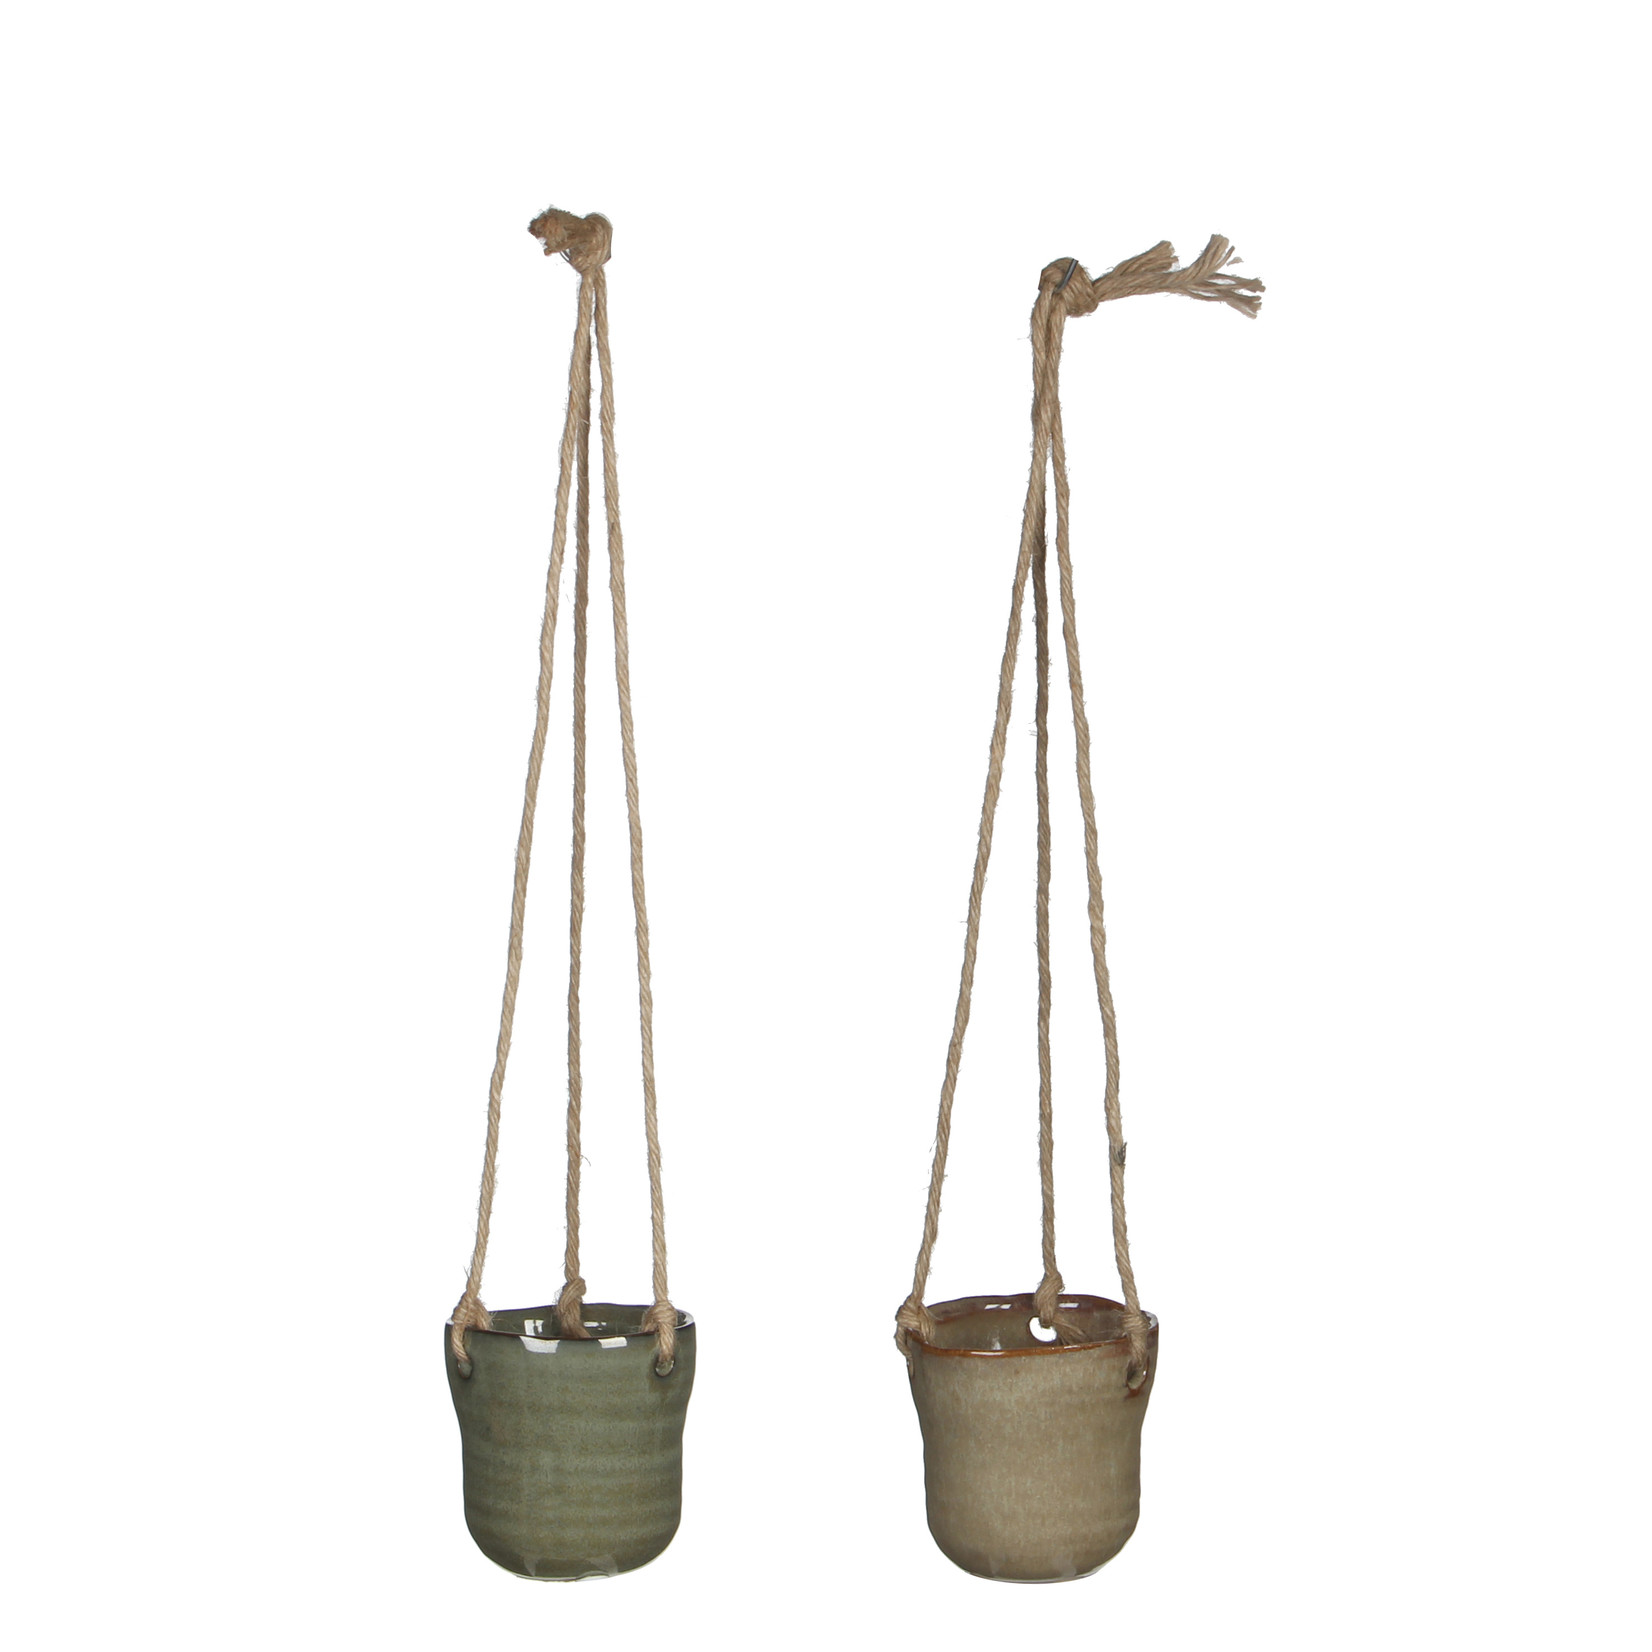 MiCa 1022489 Hangpot Stef groen taupe